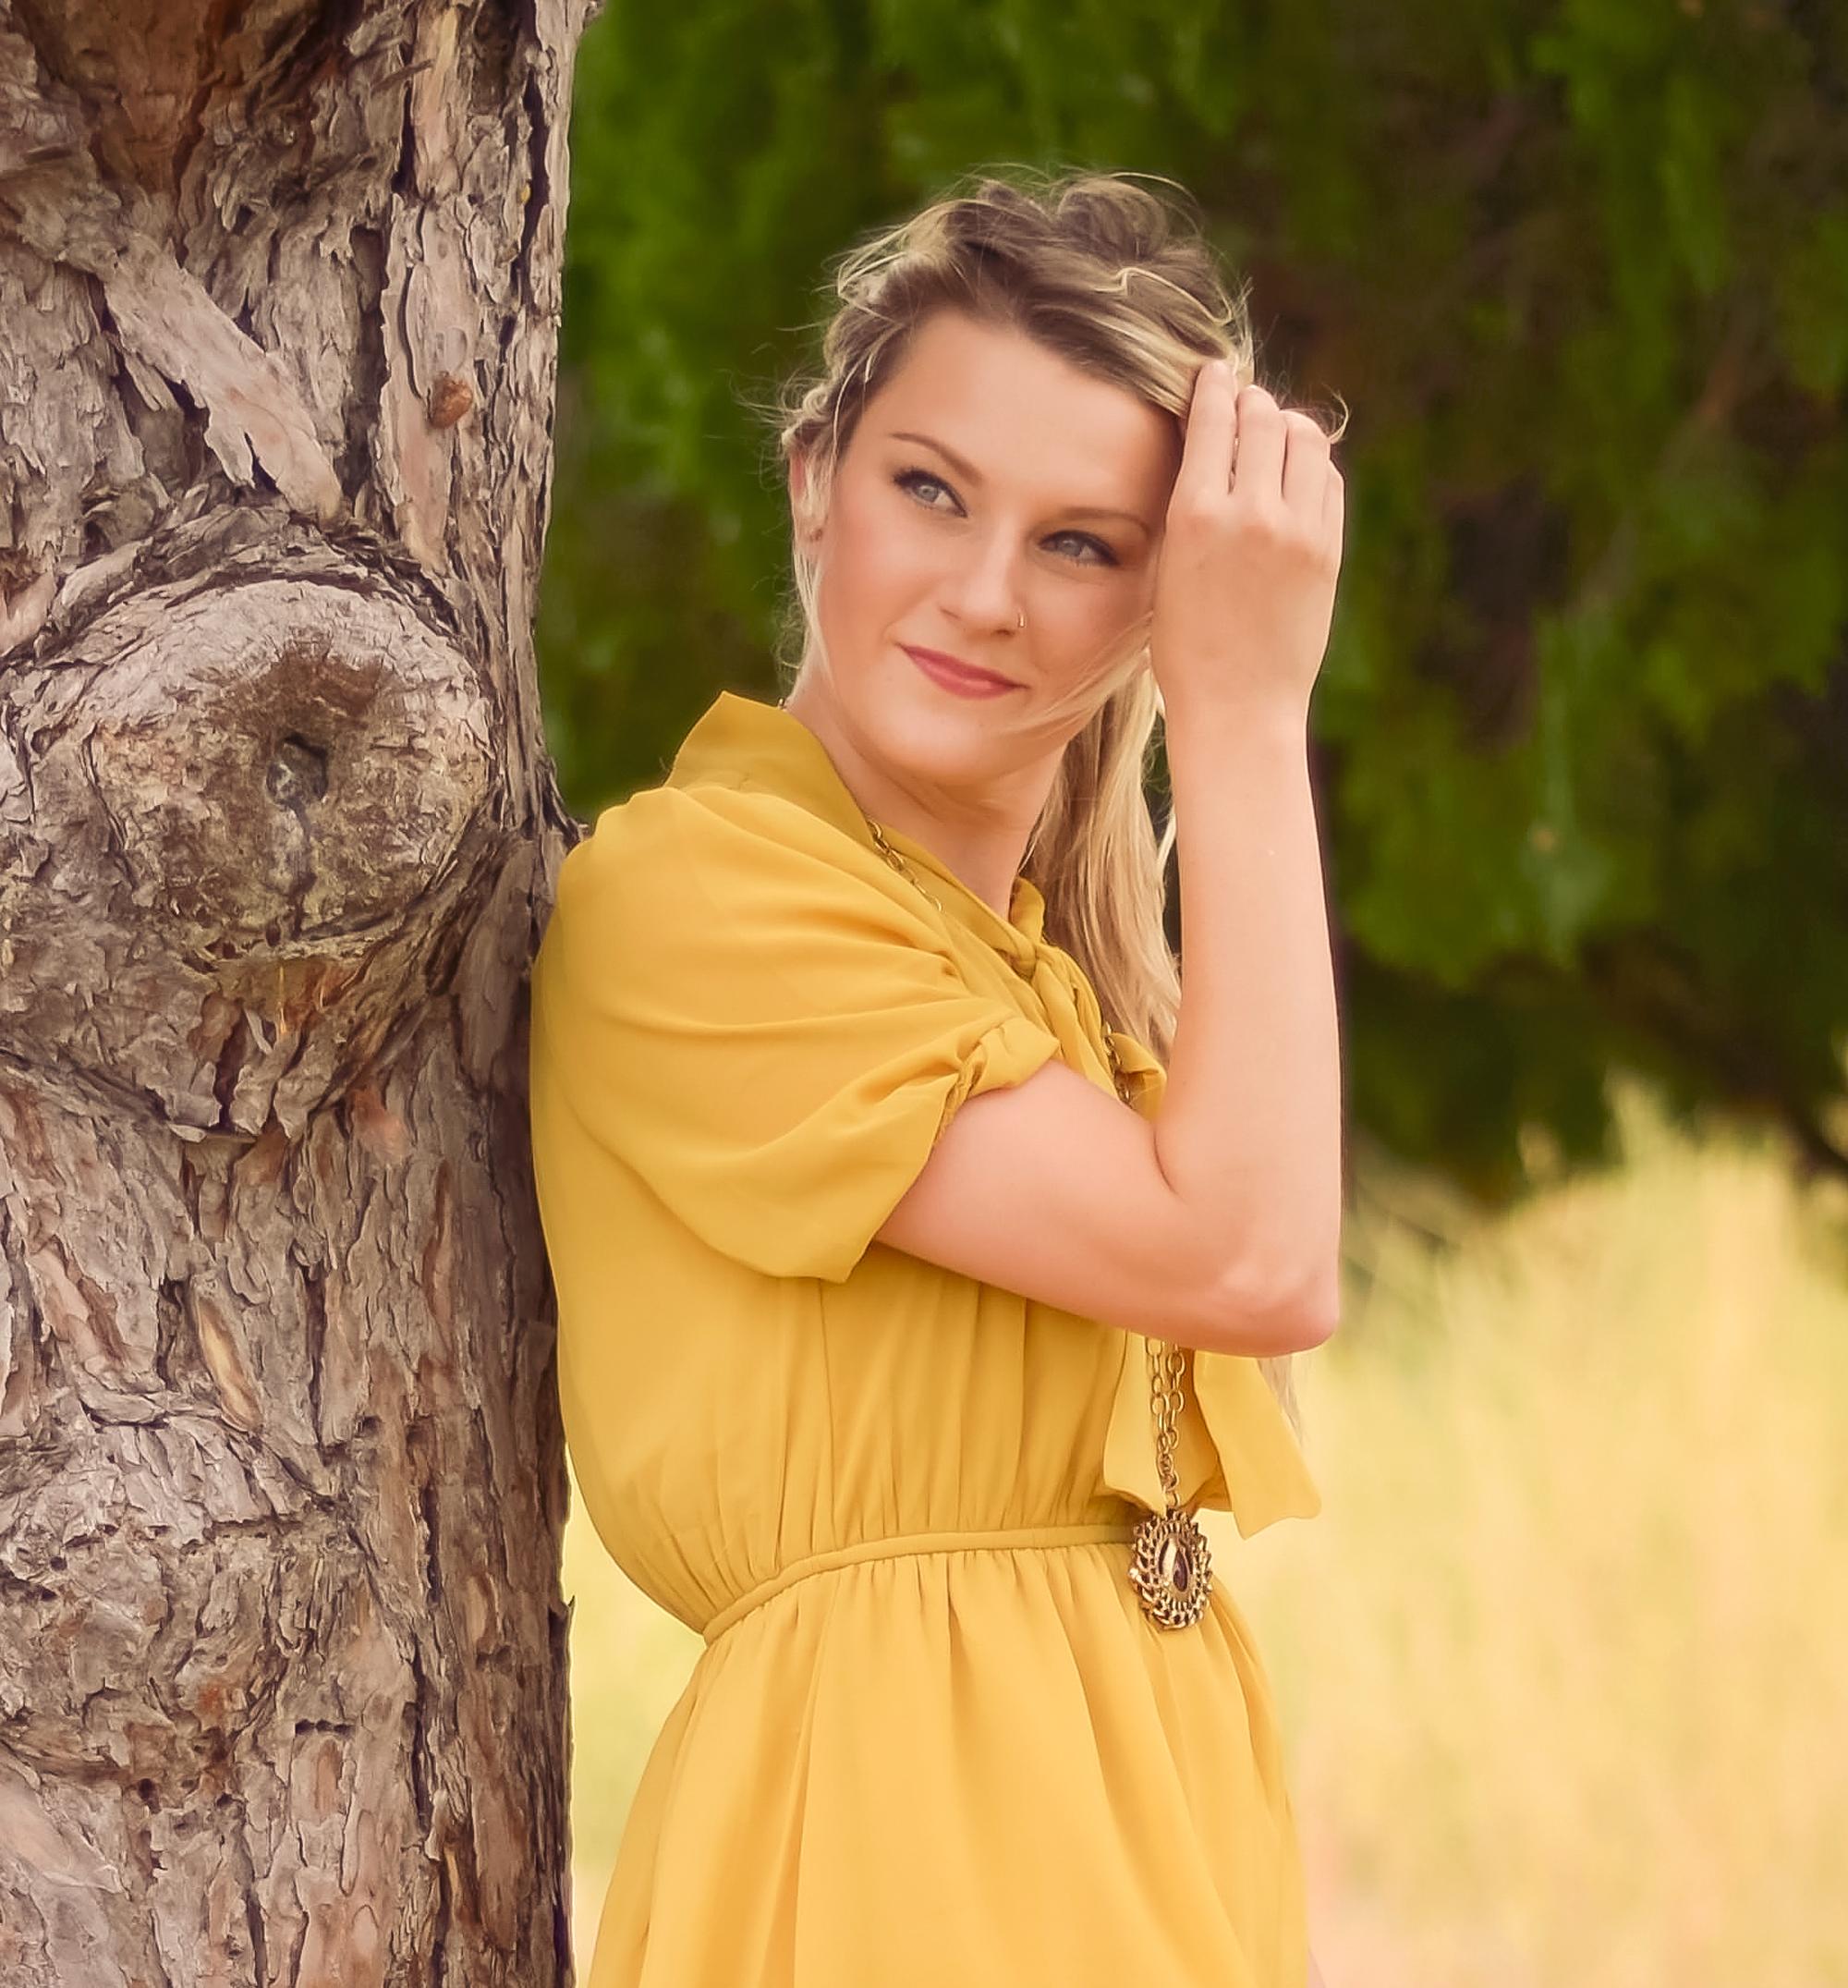 Happy Fall { mustard yellow bow dress }